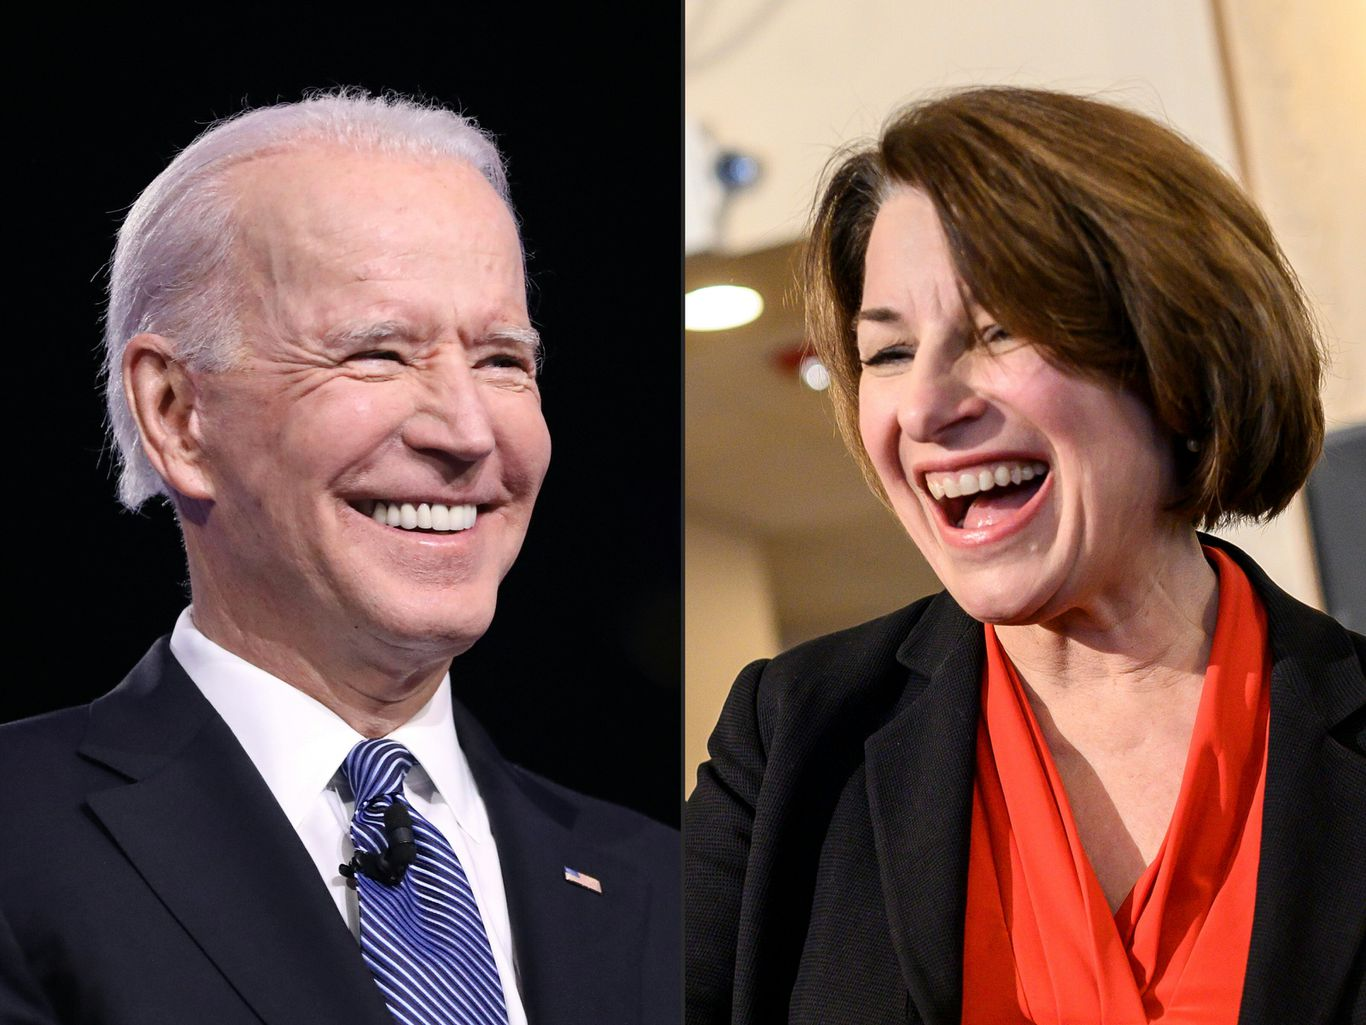 Amy Klobuchar withdraws from consideration as Biden's VP thumbnail